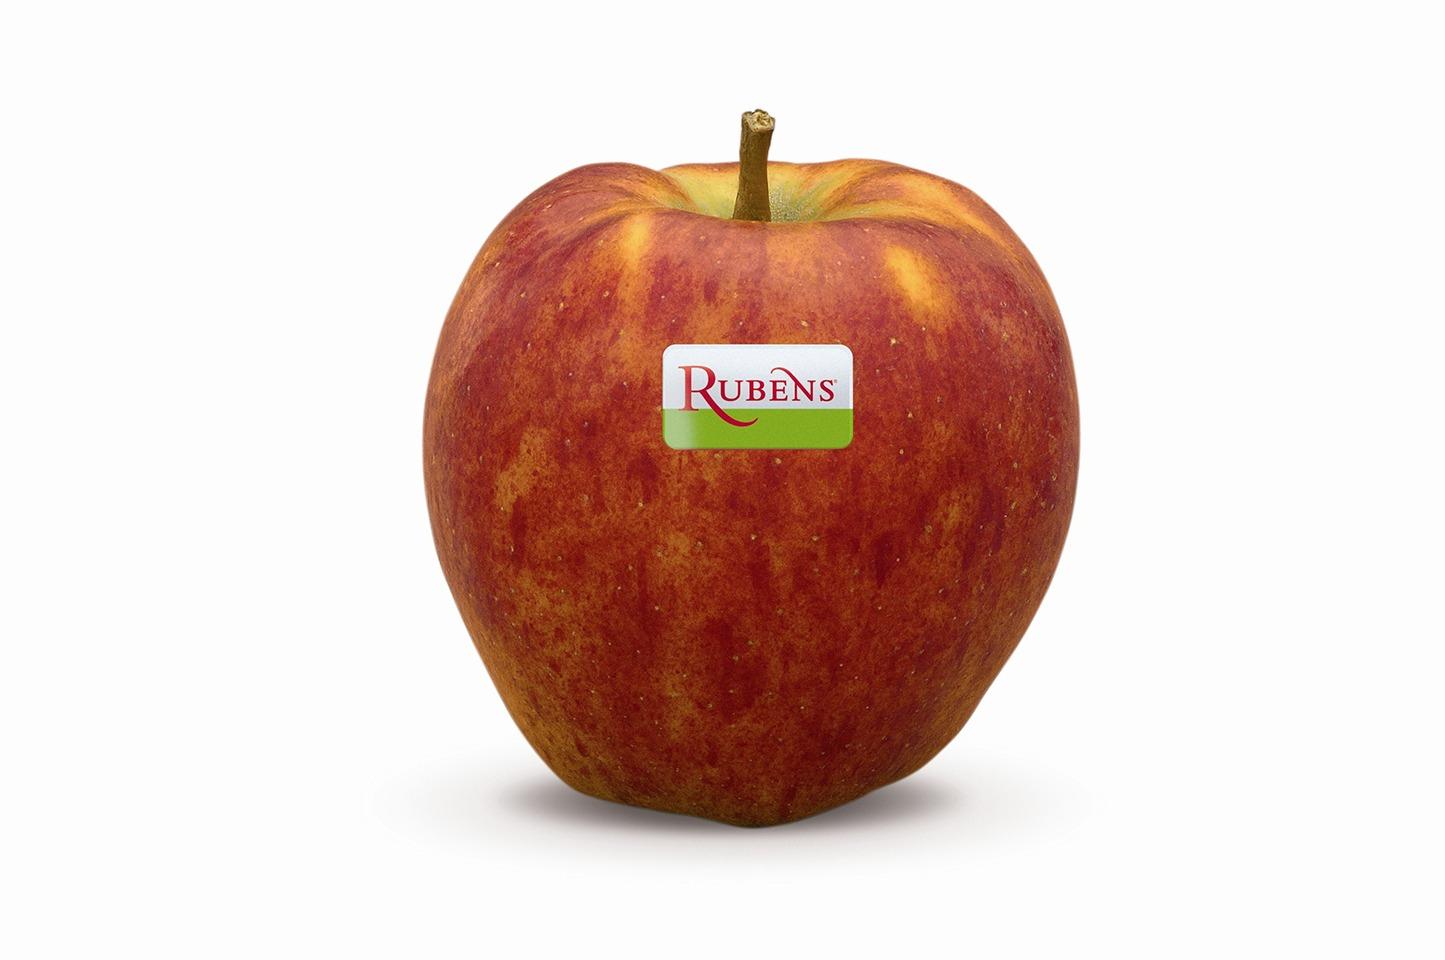 Rubens appel per kilo